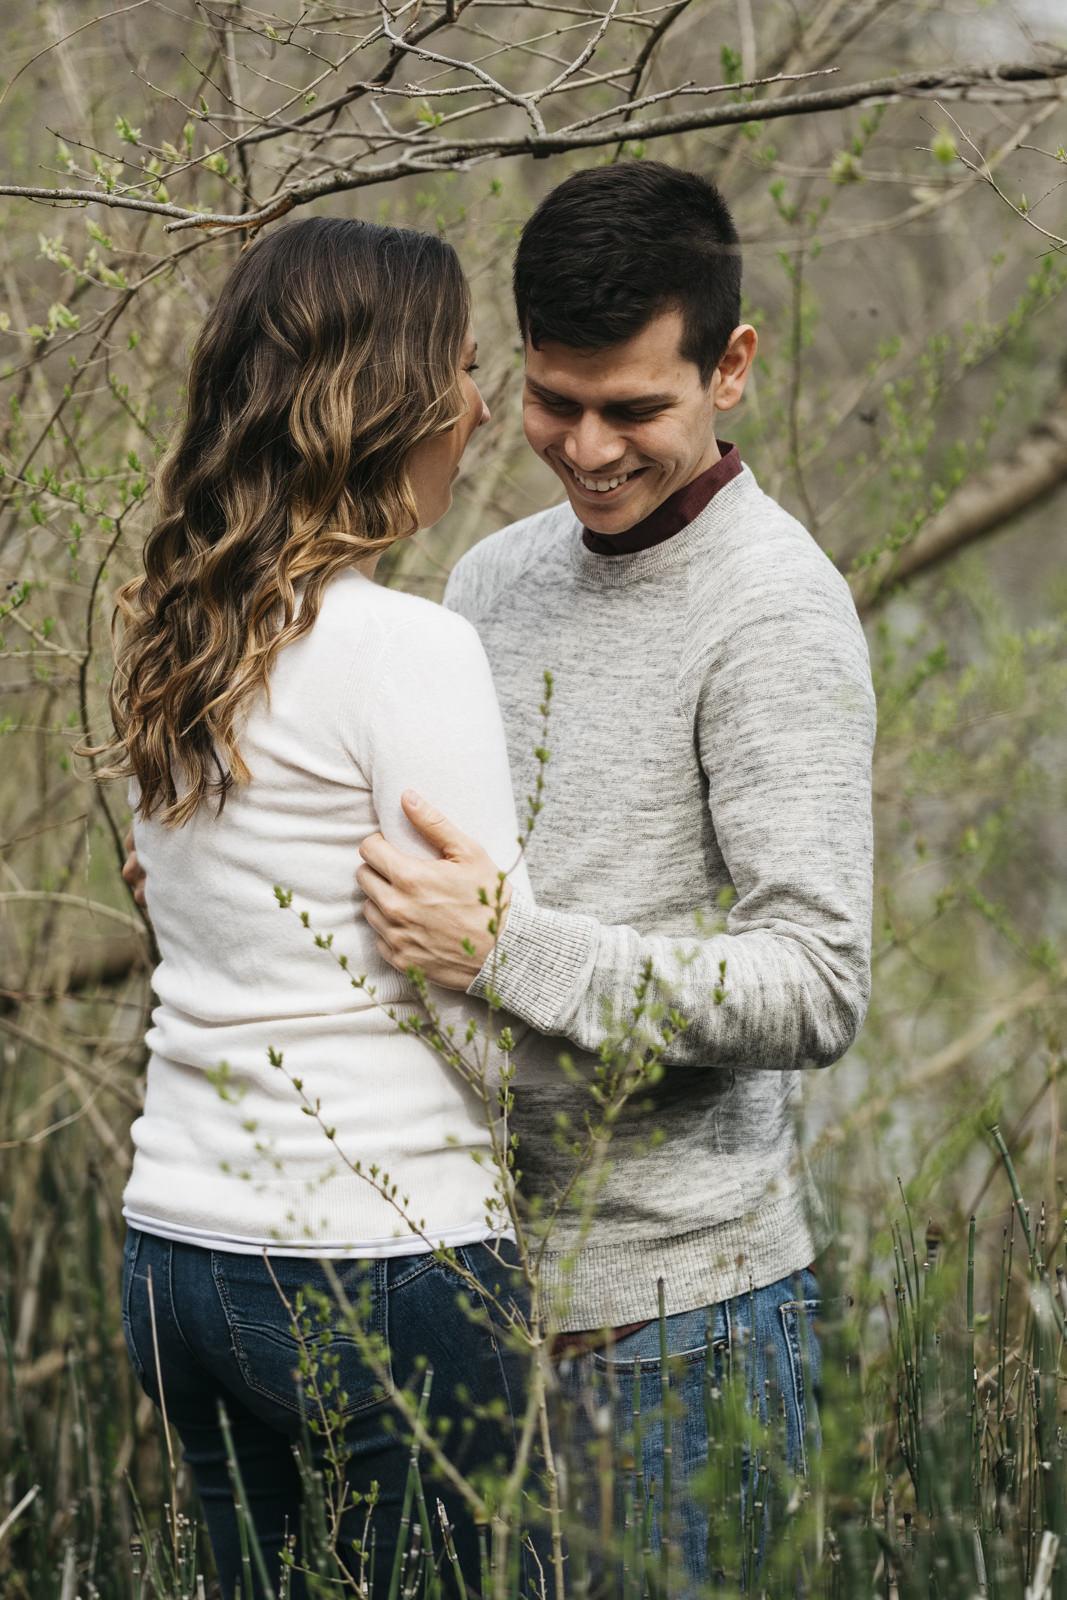 Engagement session photography at Nichols Arboretum.